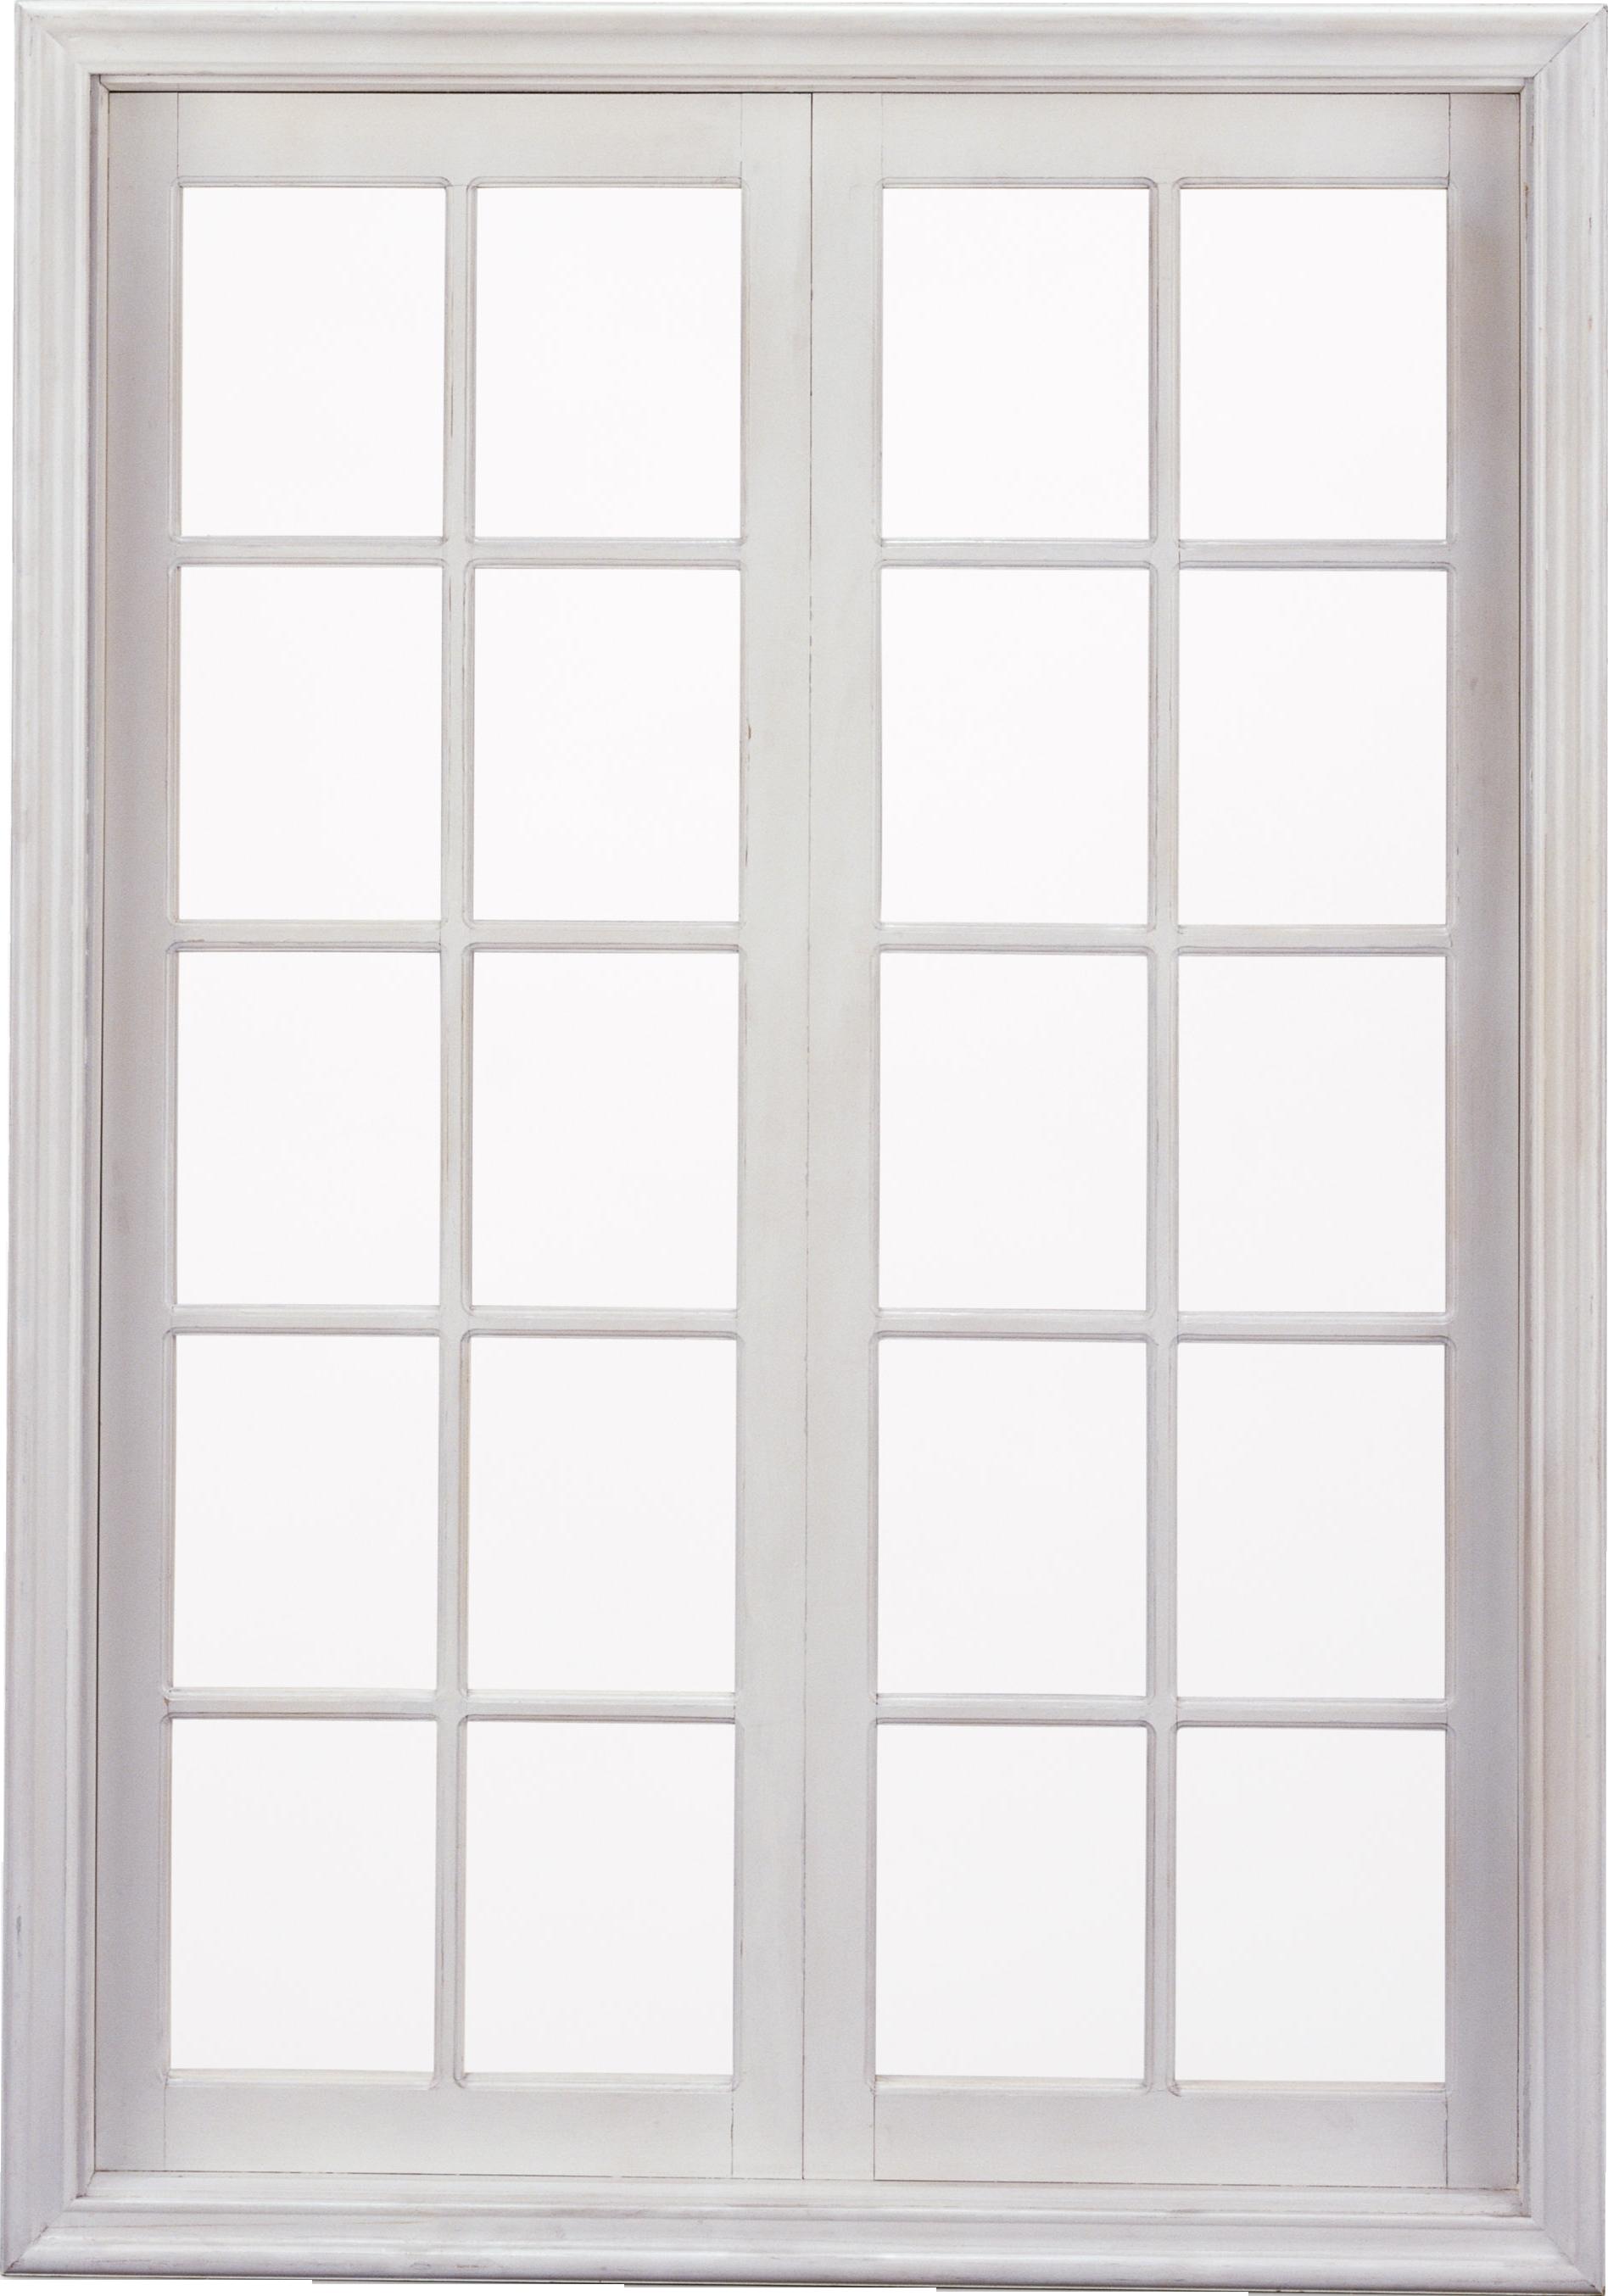 Window Png Image Minimalist Desktop Wallpaper Window Design Windows